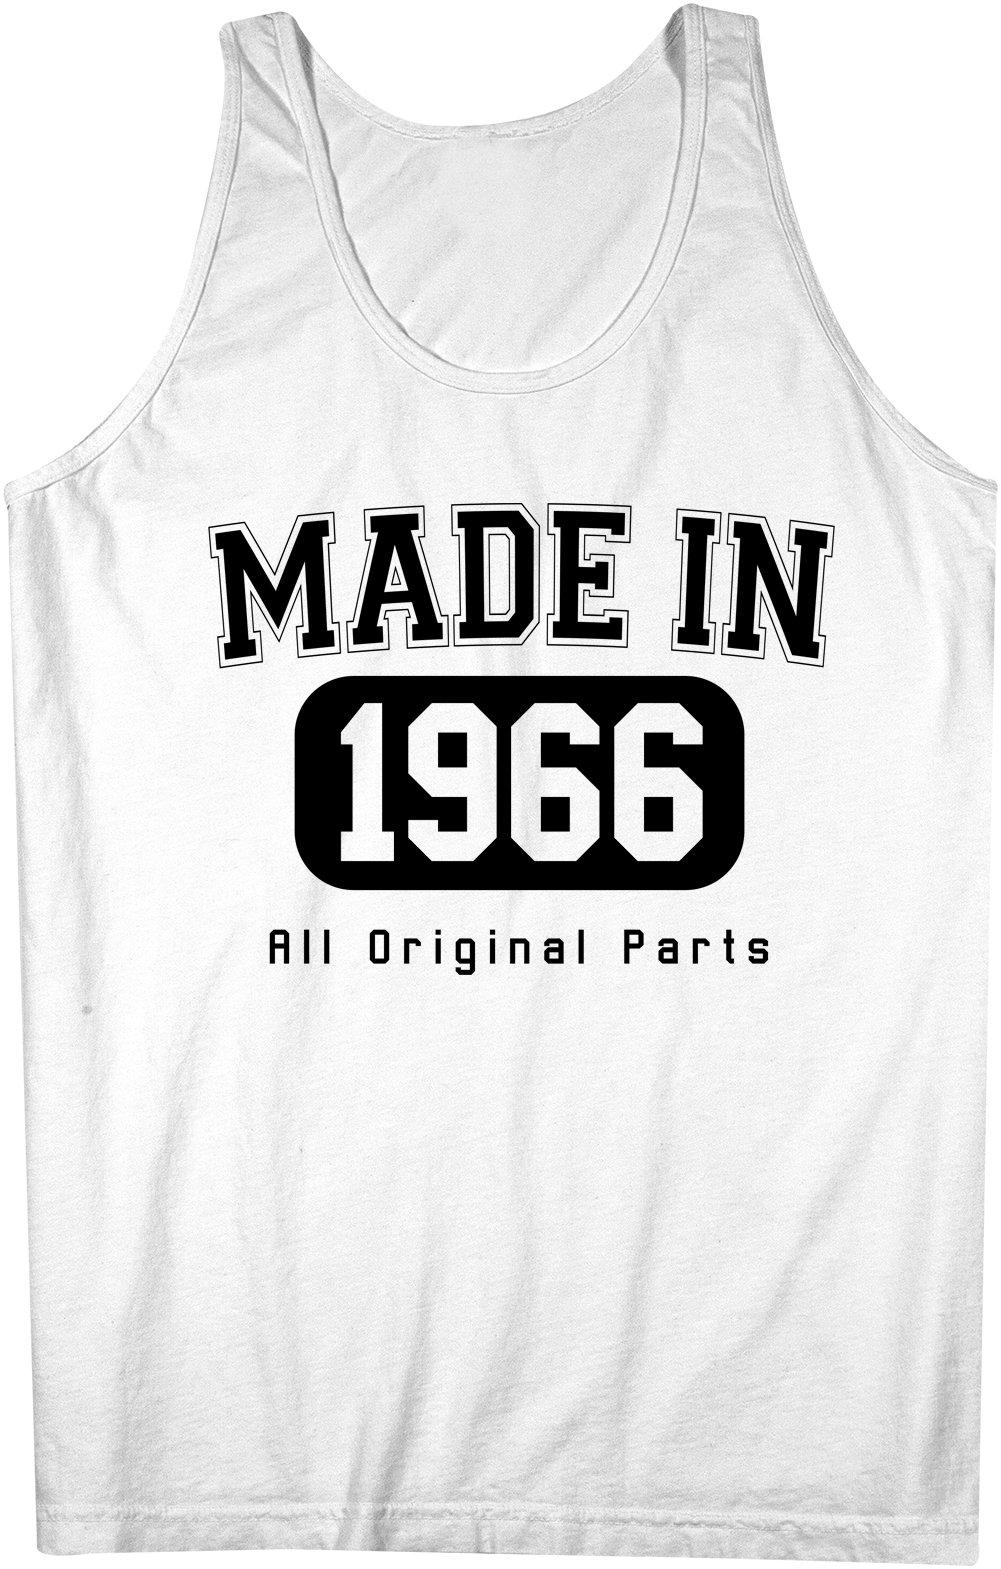 Made In 1966 All Original Parts Birthday Funny Sleeveless X 5093 Shirts